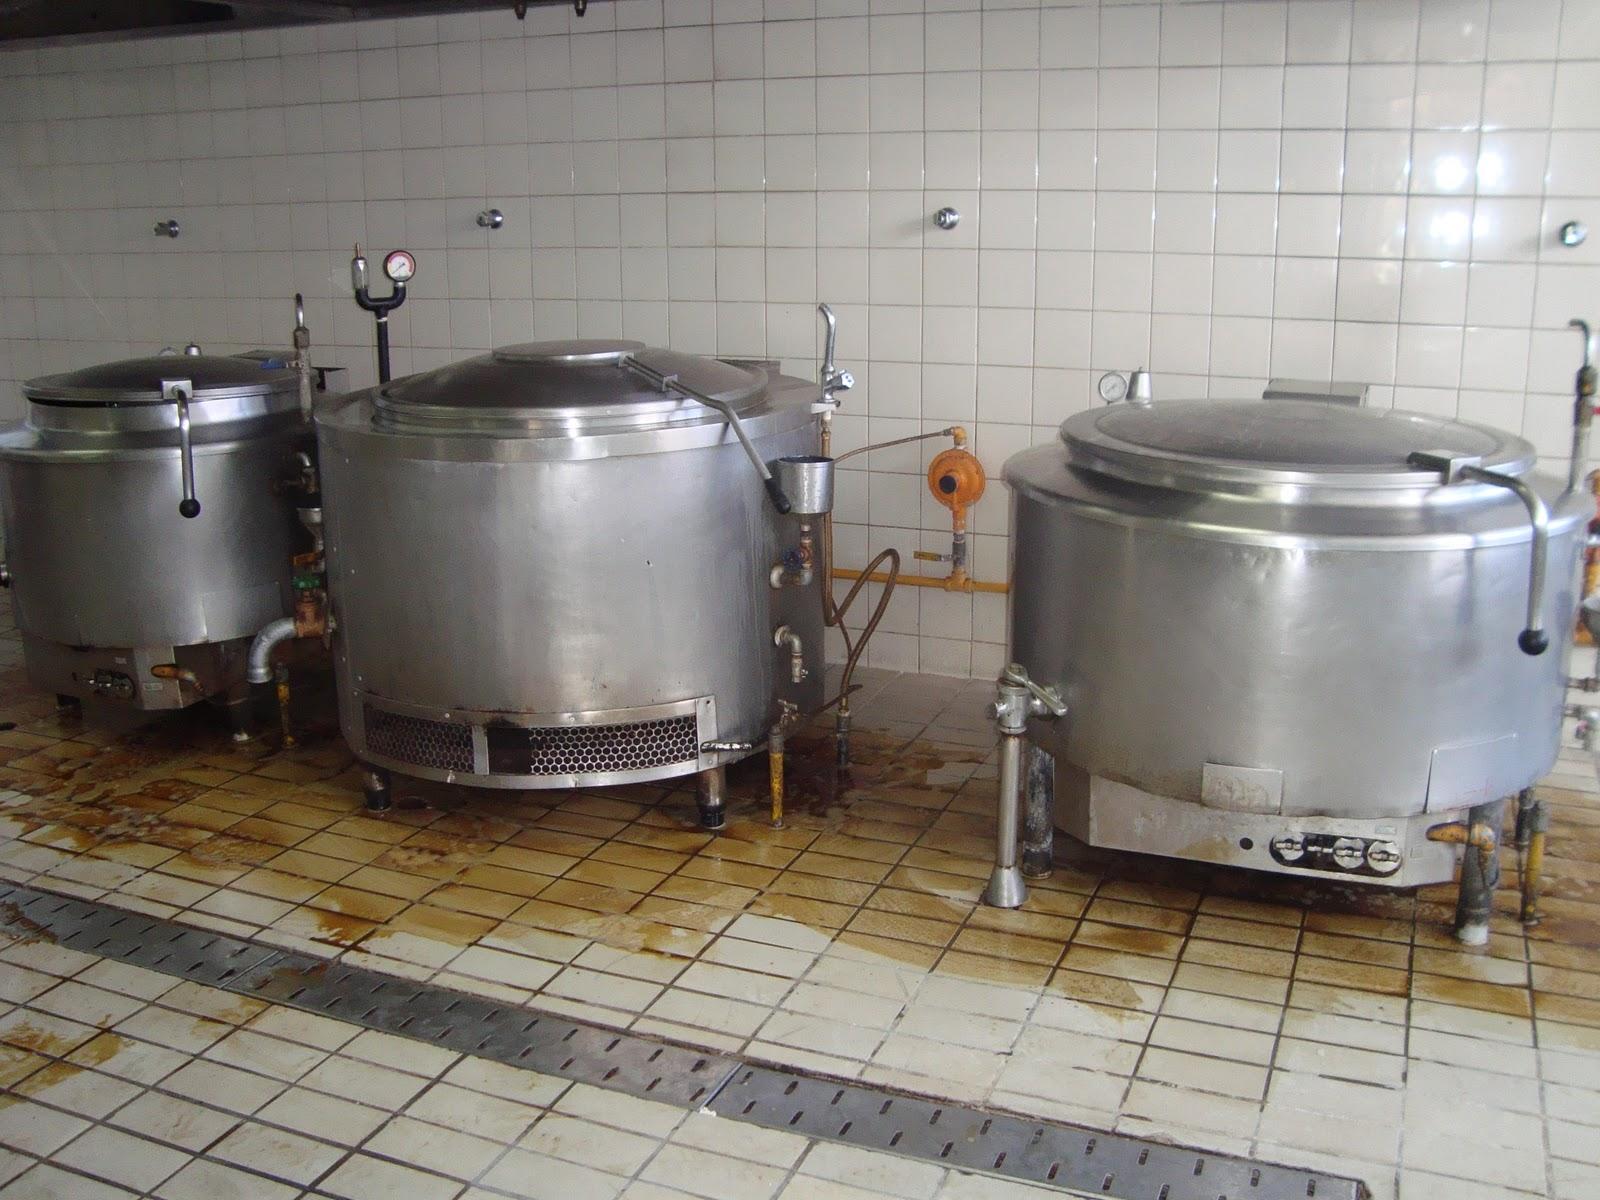 LIMPEZATA: Limpeza cozinha industrial #604A33 1600 1200